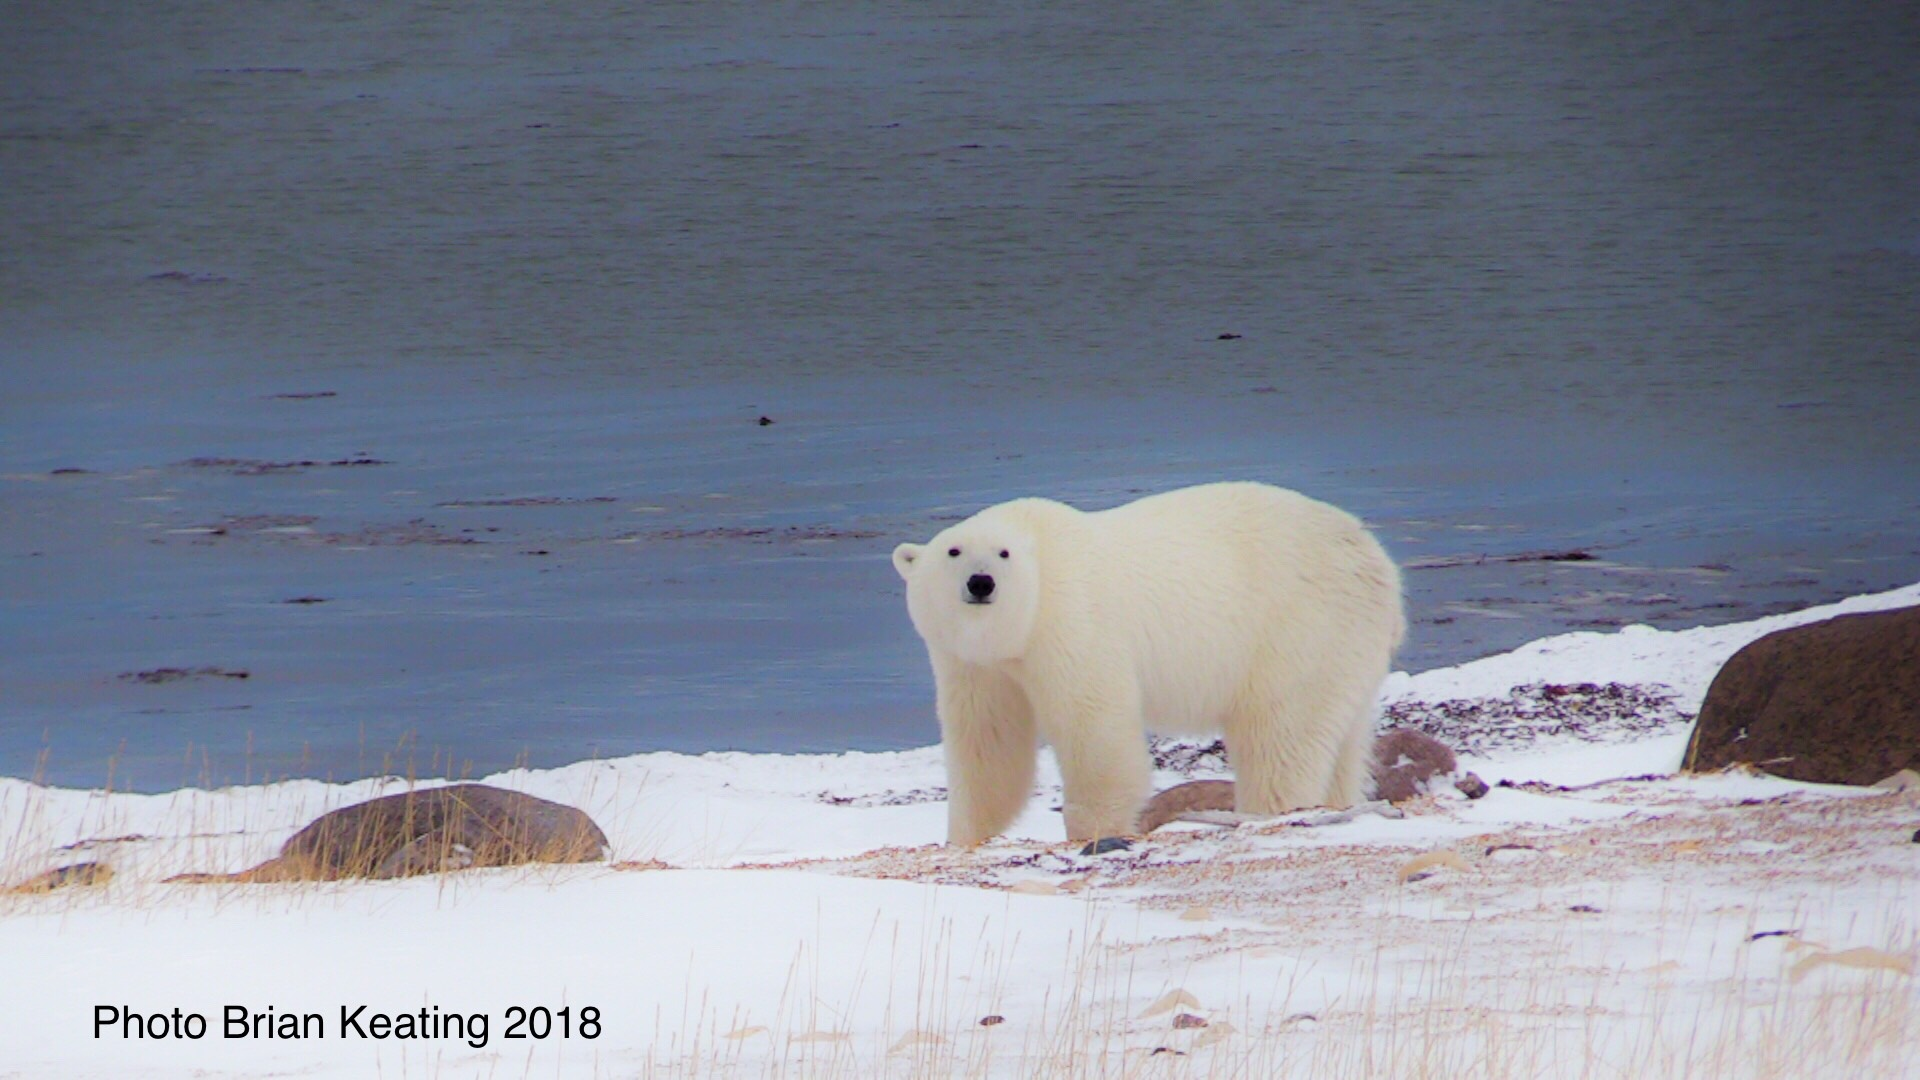 Brian Keating Polar Bear 3